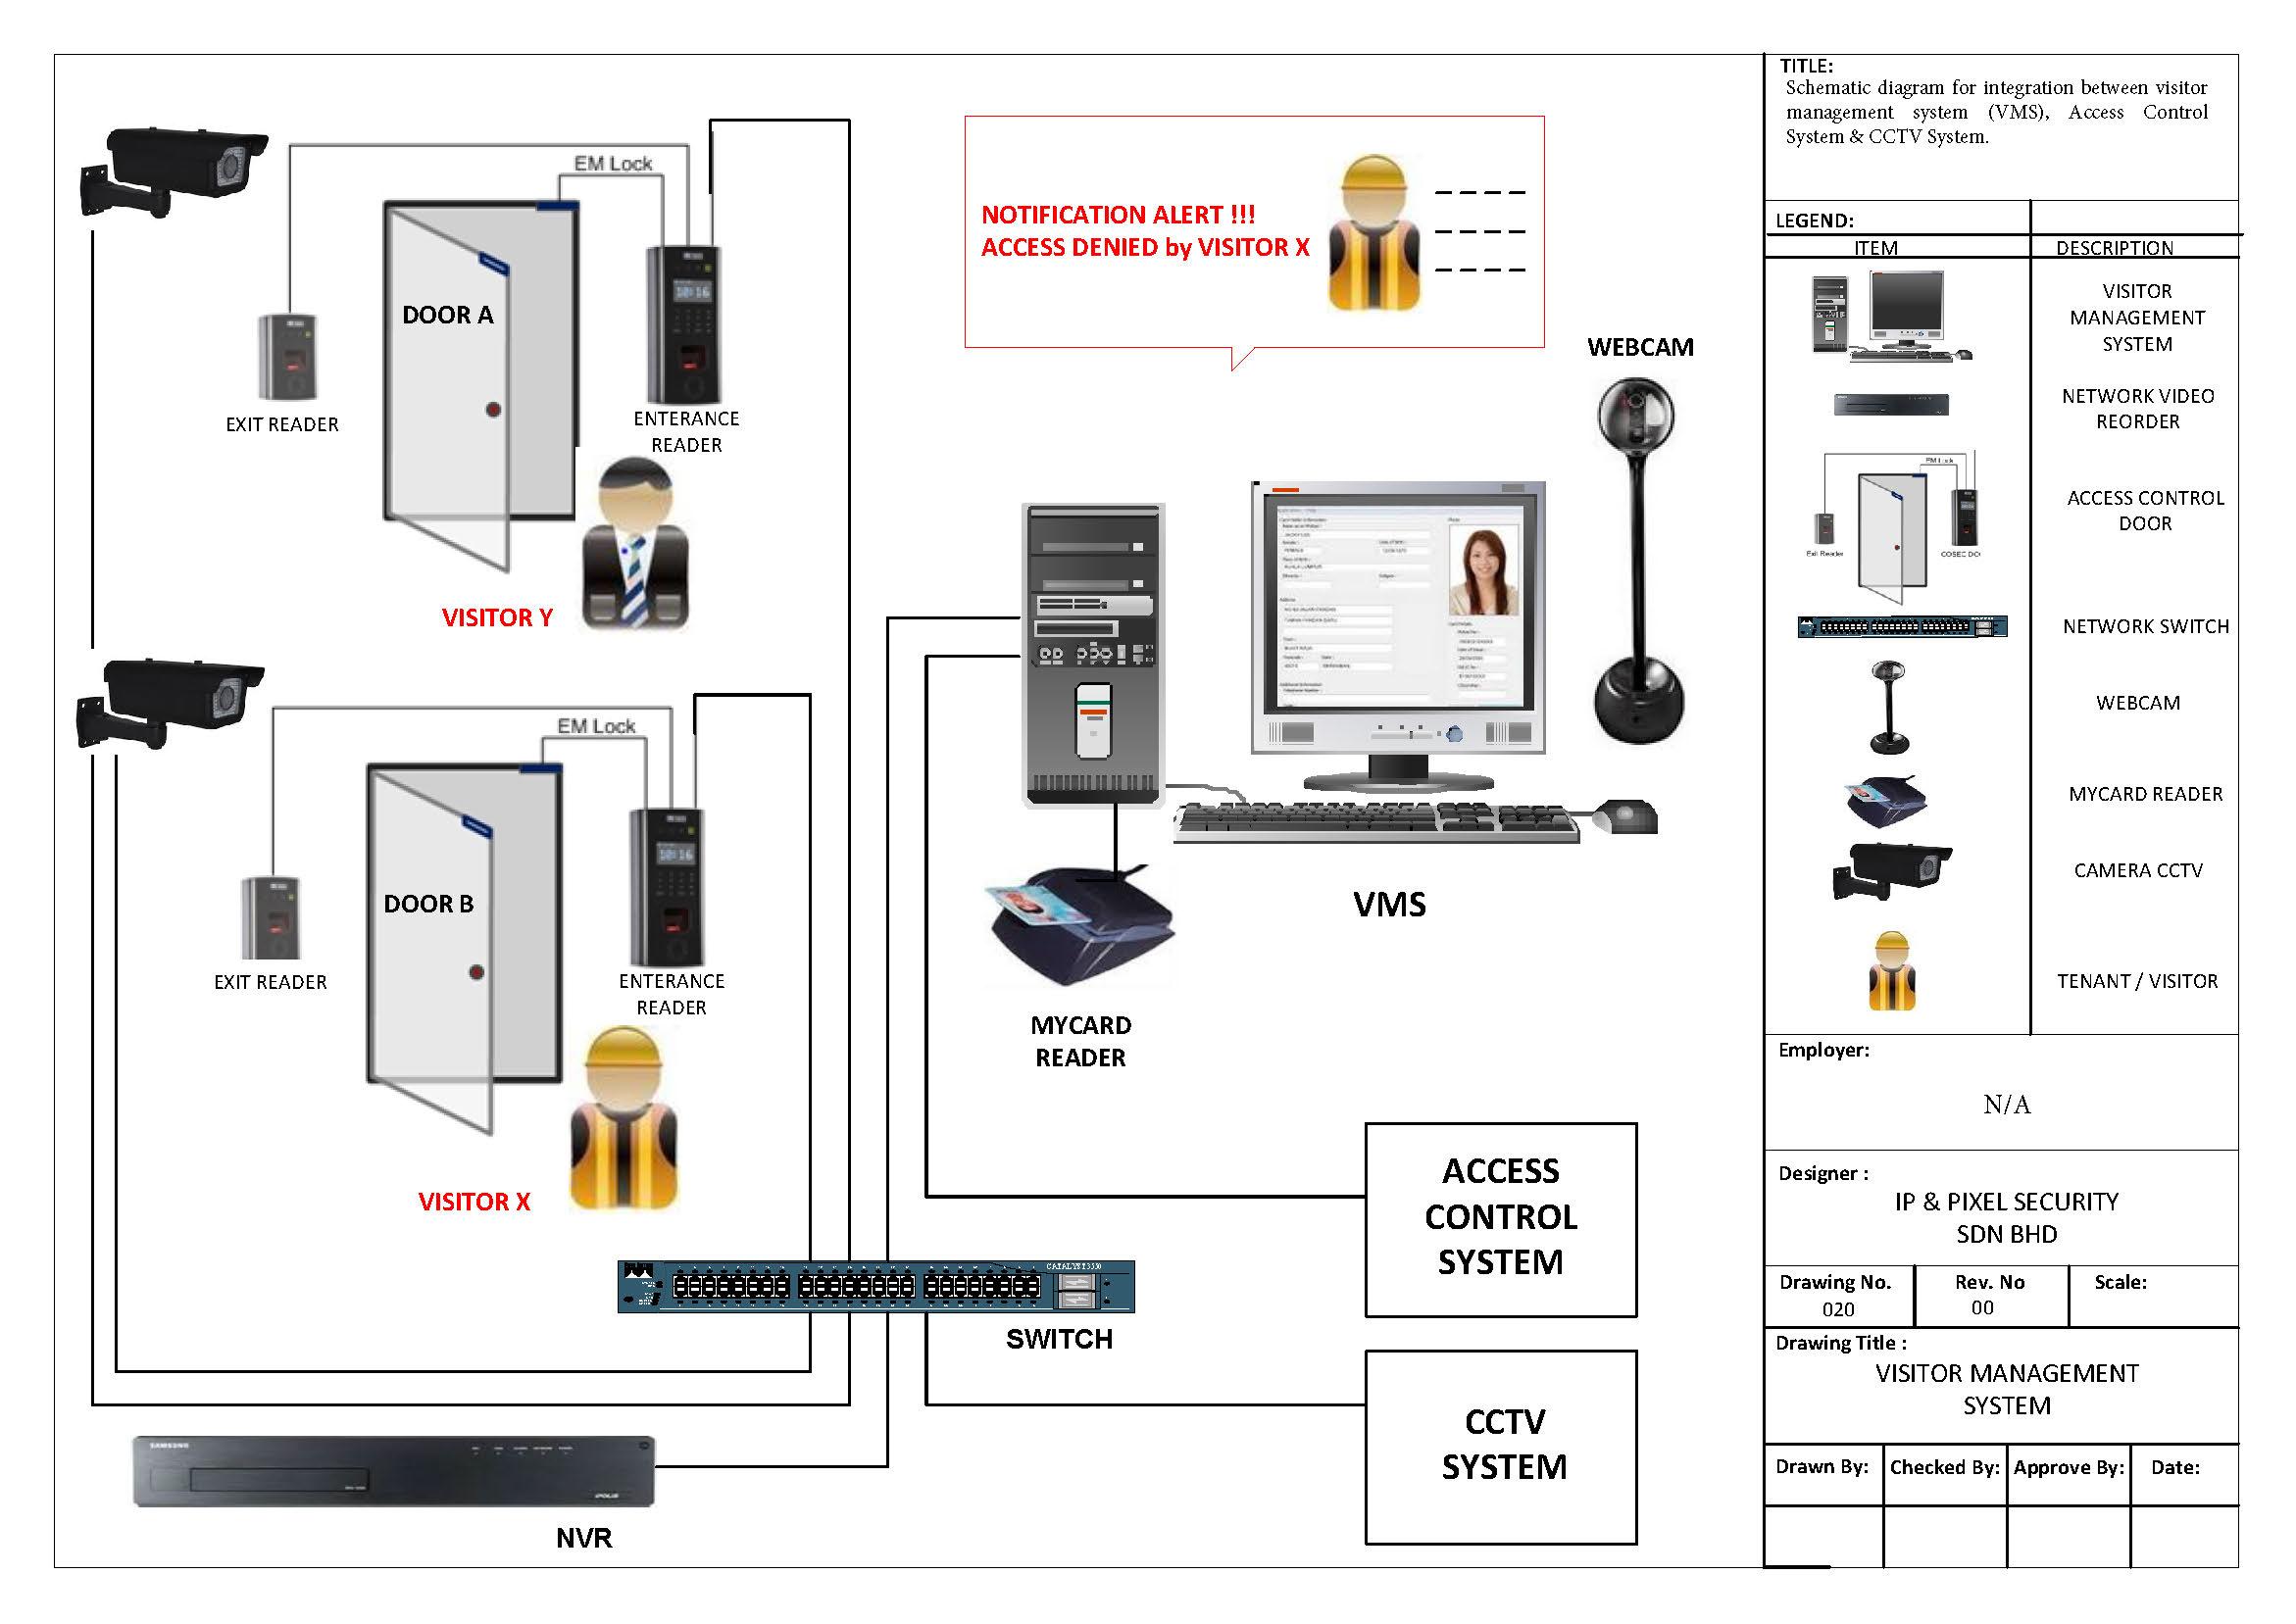 building management system wiring diagram nk 2204  cctv camera wiring diagram pdf  nk 2204  cctv camera wiring diagram pdf